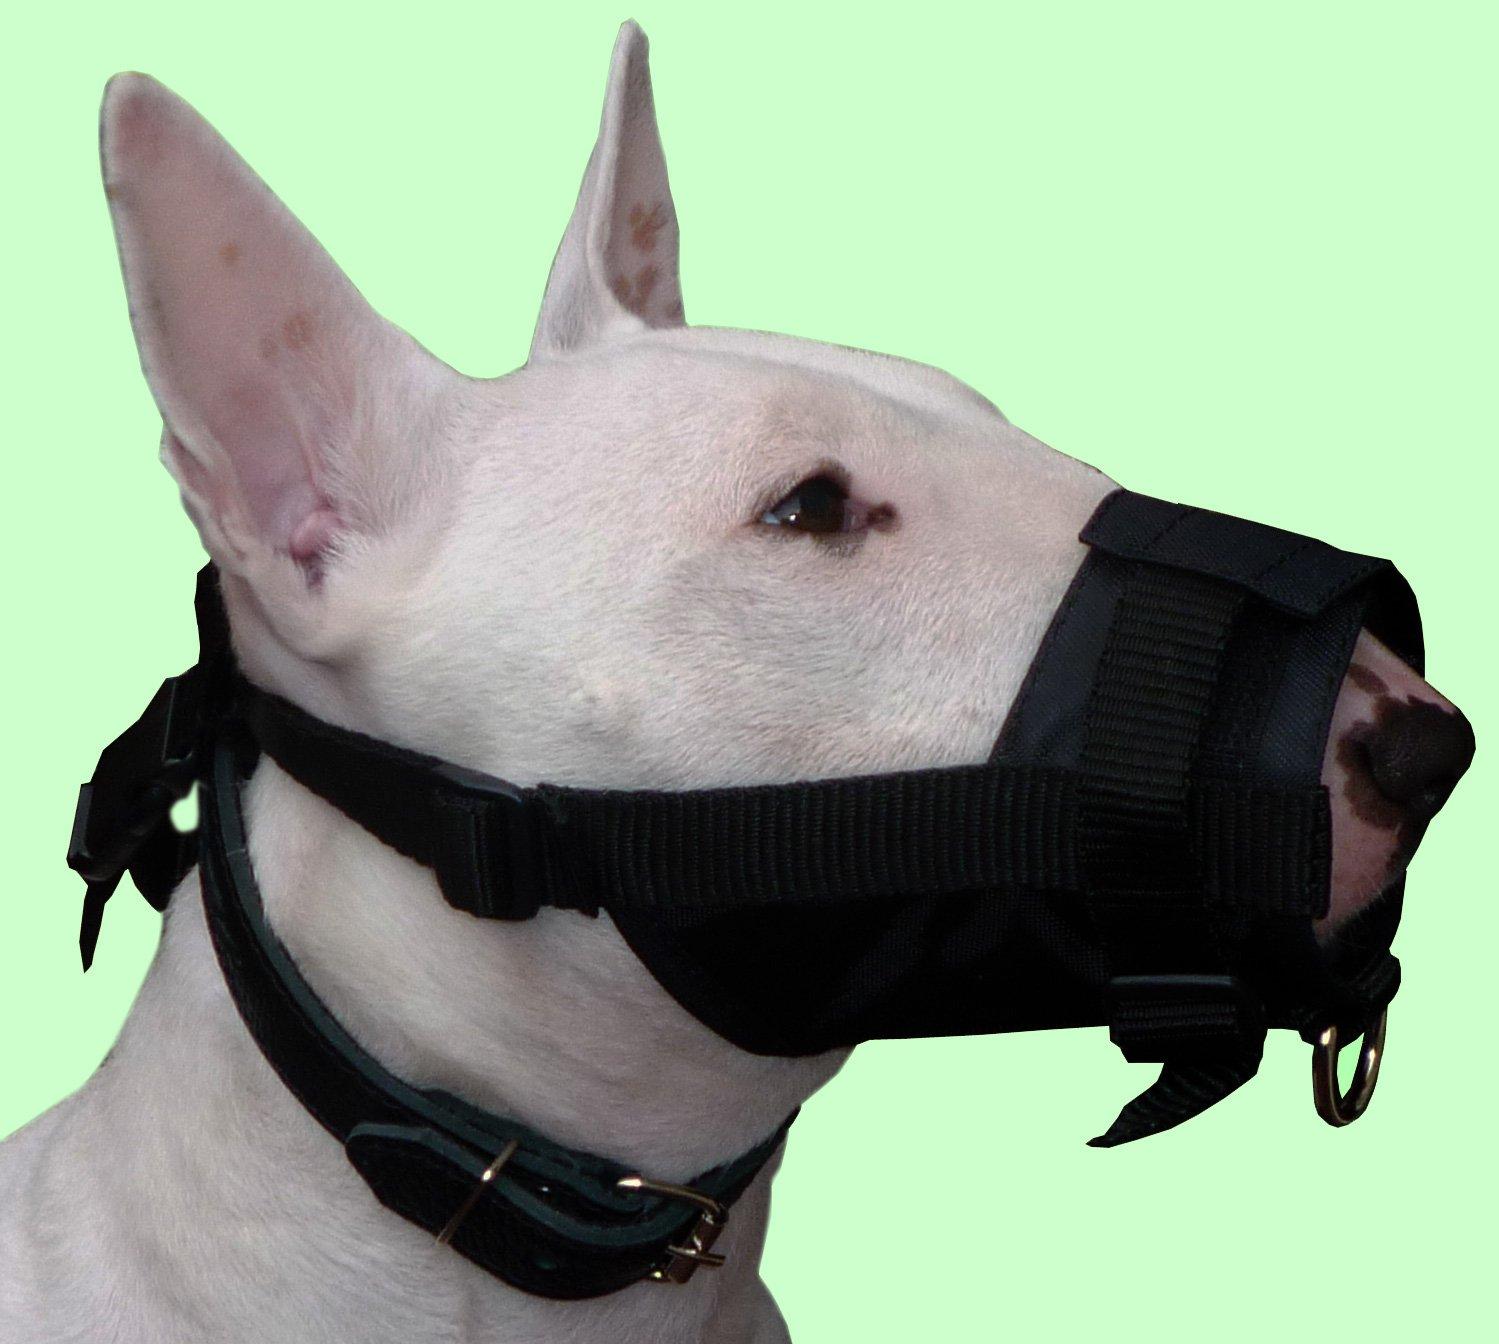 Adjustable Nylon Dog Grooming Black Muzzle No Bite 7.5''-10'' size Medium, Retriever, Spaniel, Brittany, Collie,